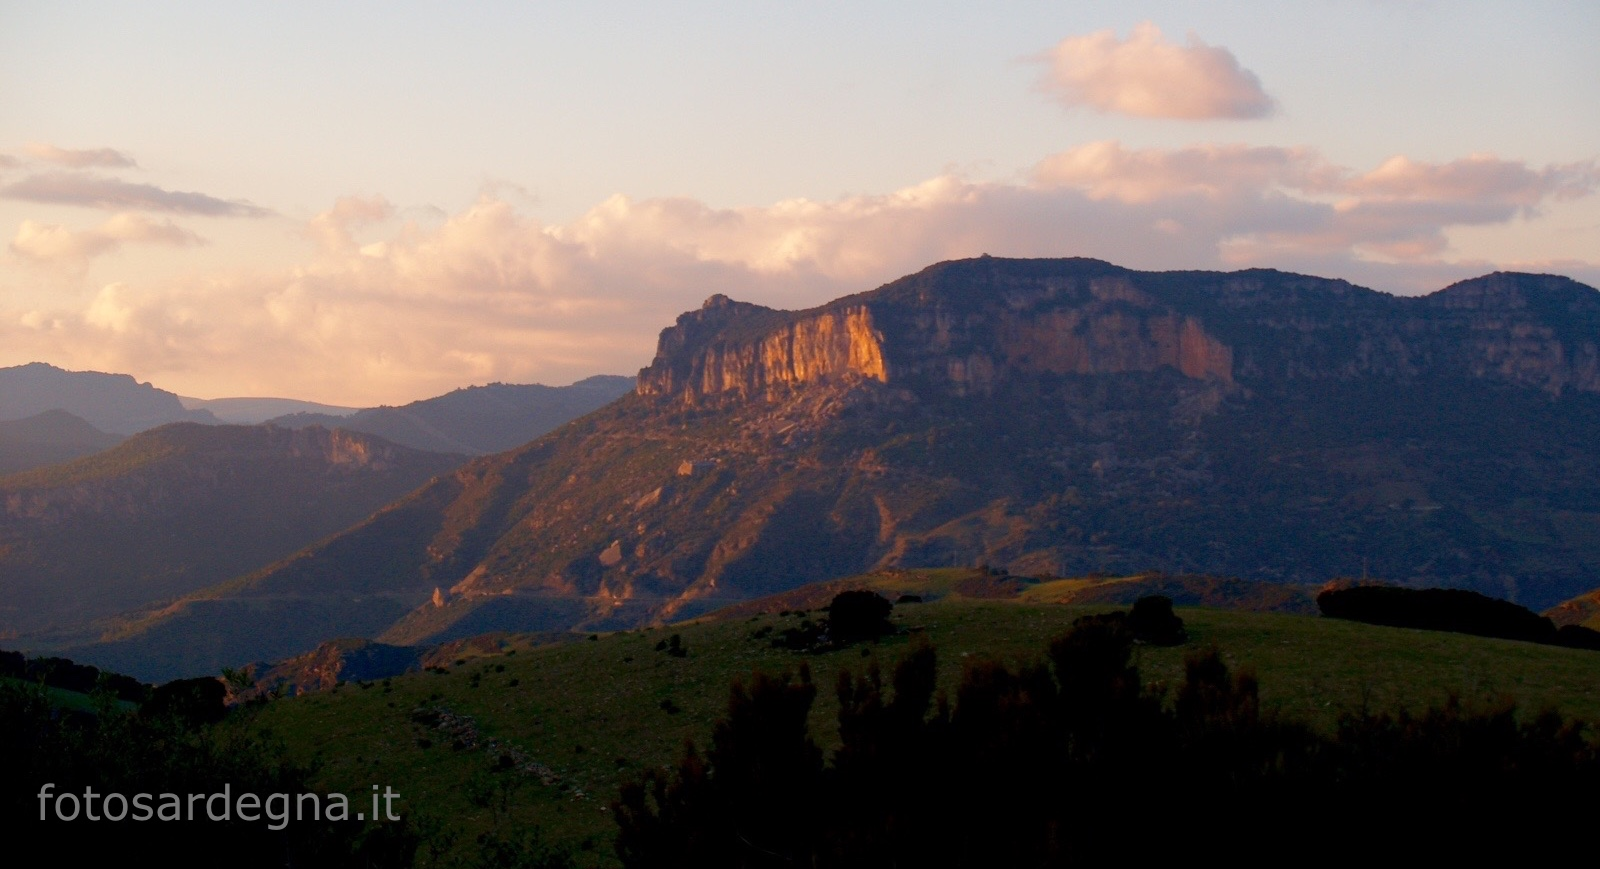 Tramonto sul Taccu su Accara, Ulassai.